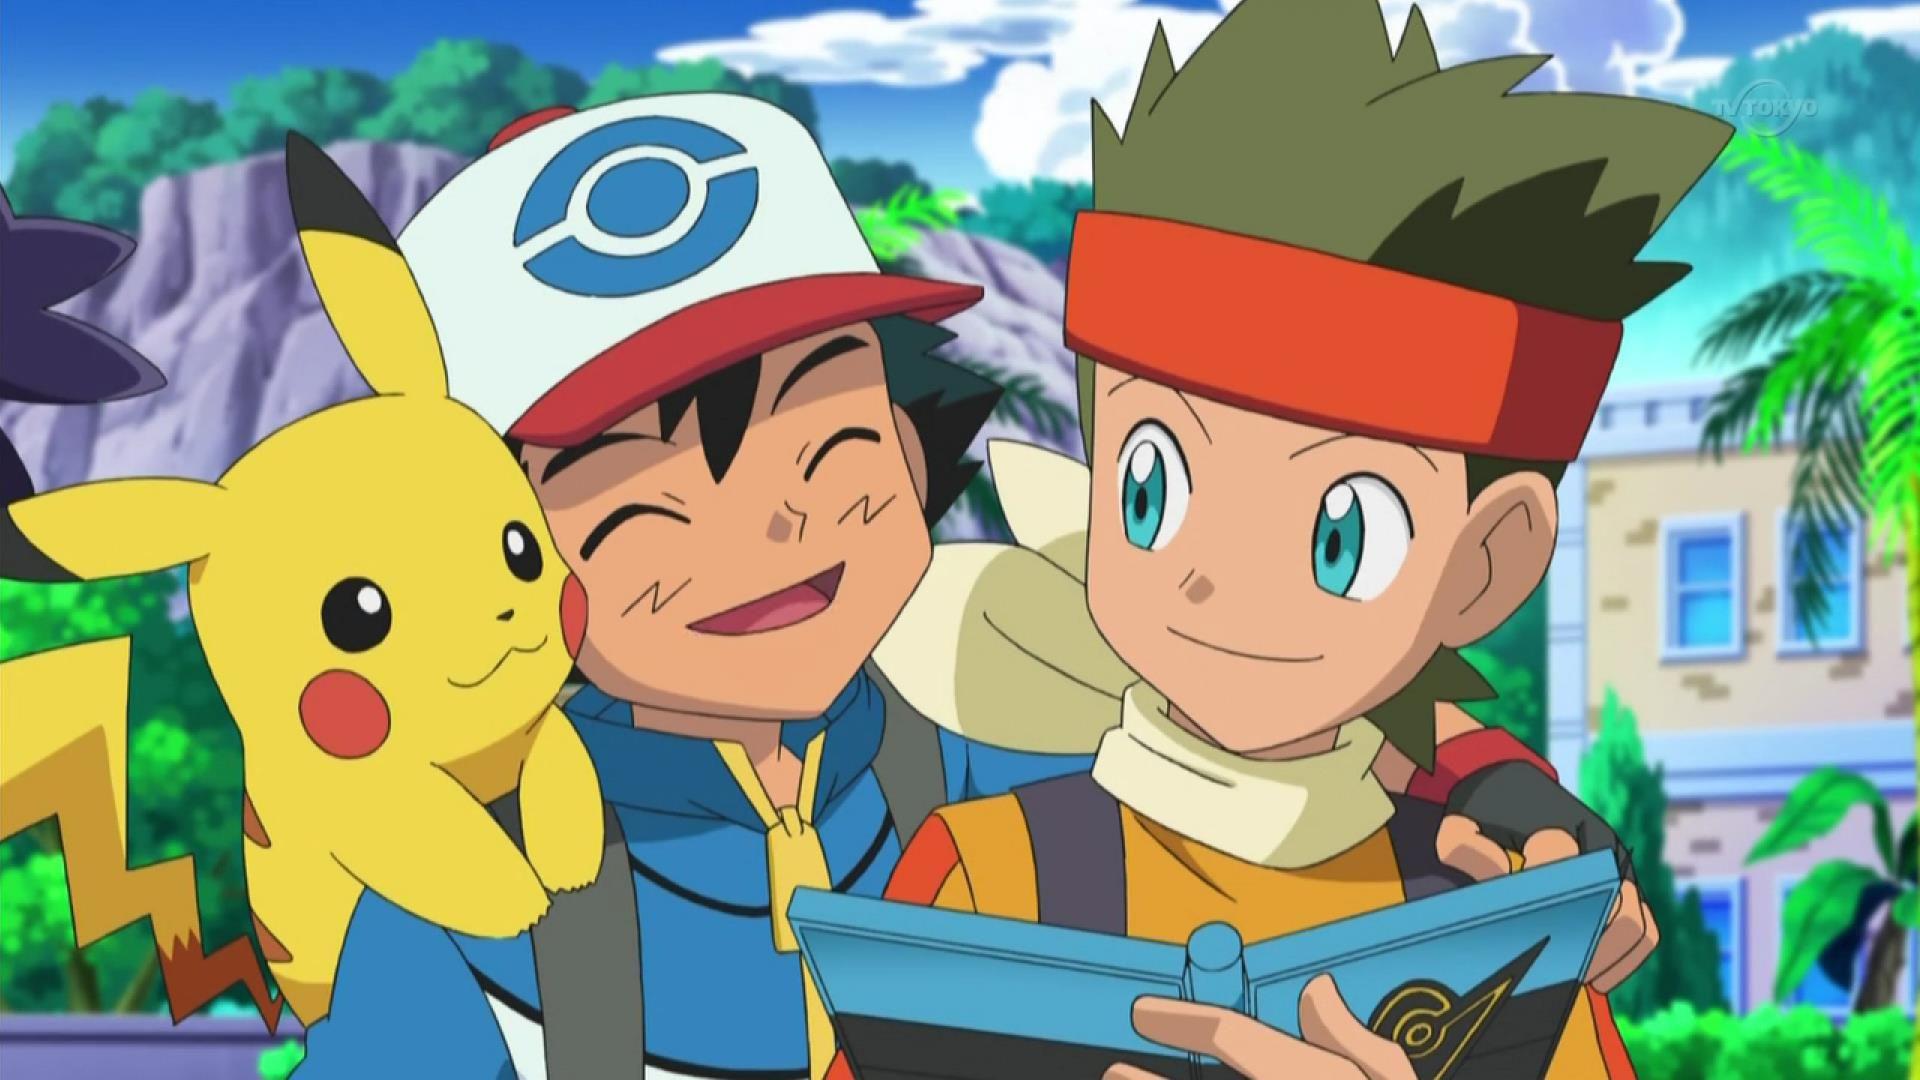 Jwittz pokemon relationships dating